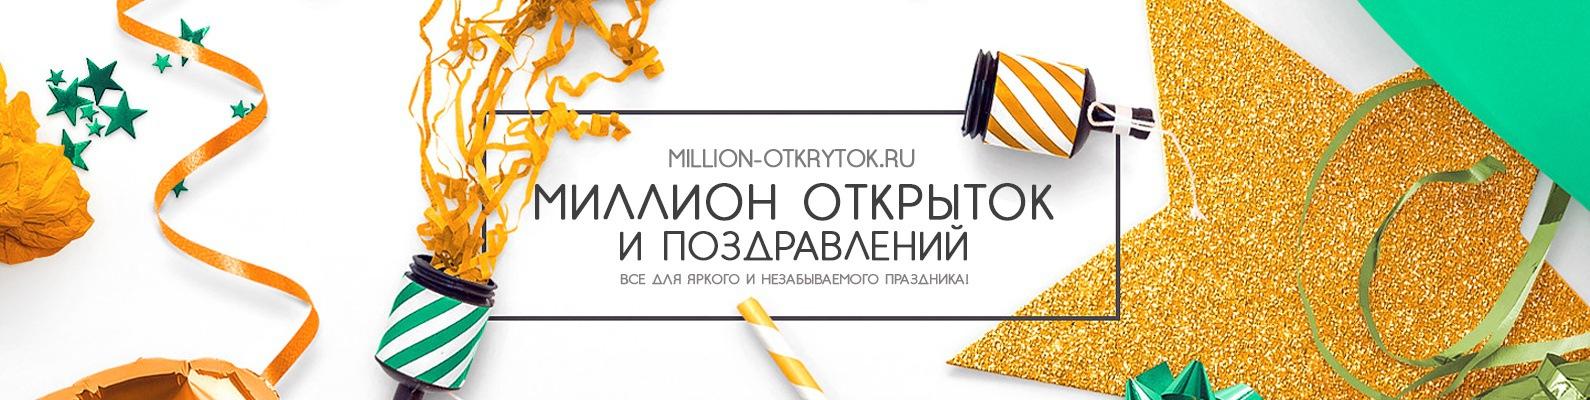 Миллион открытки ру